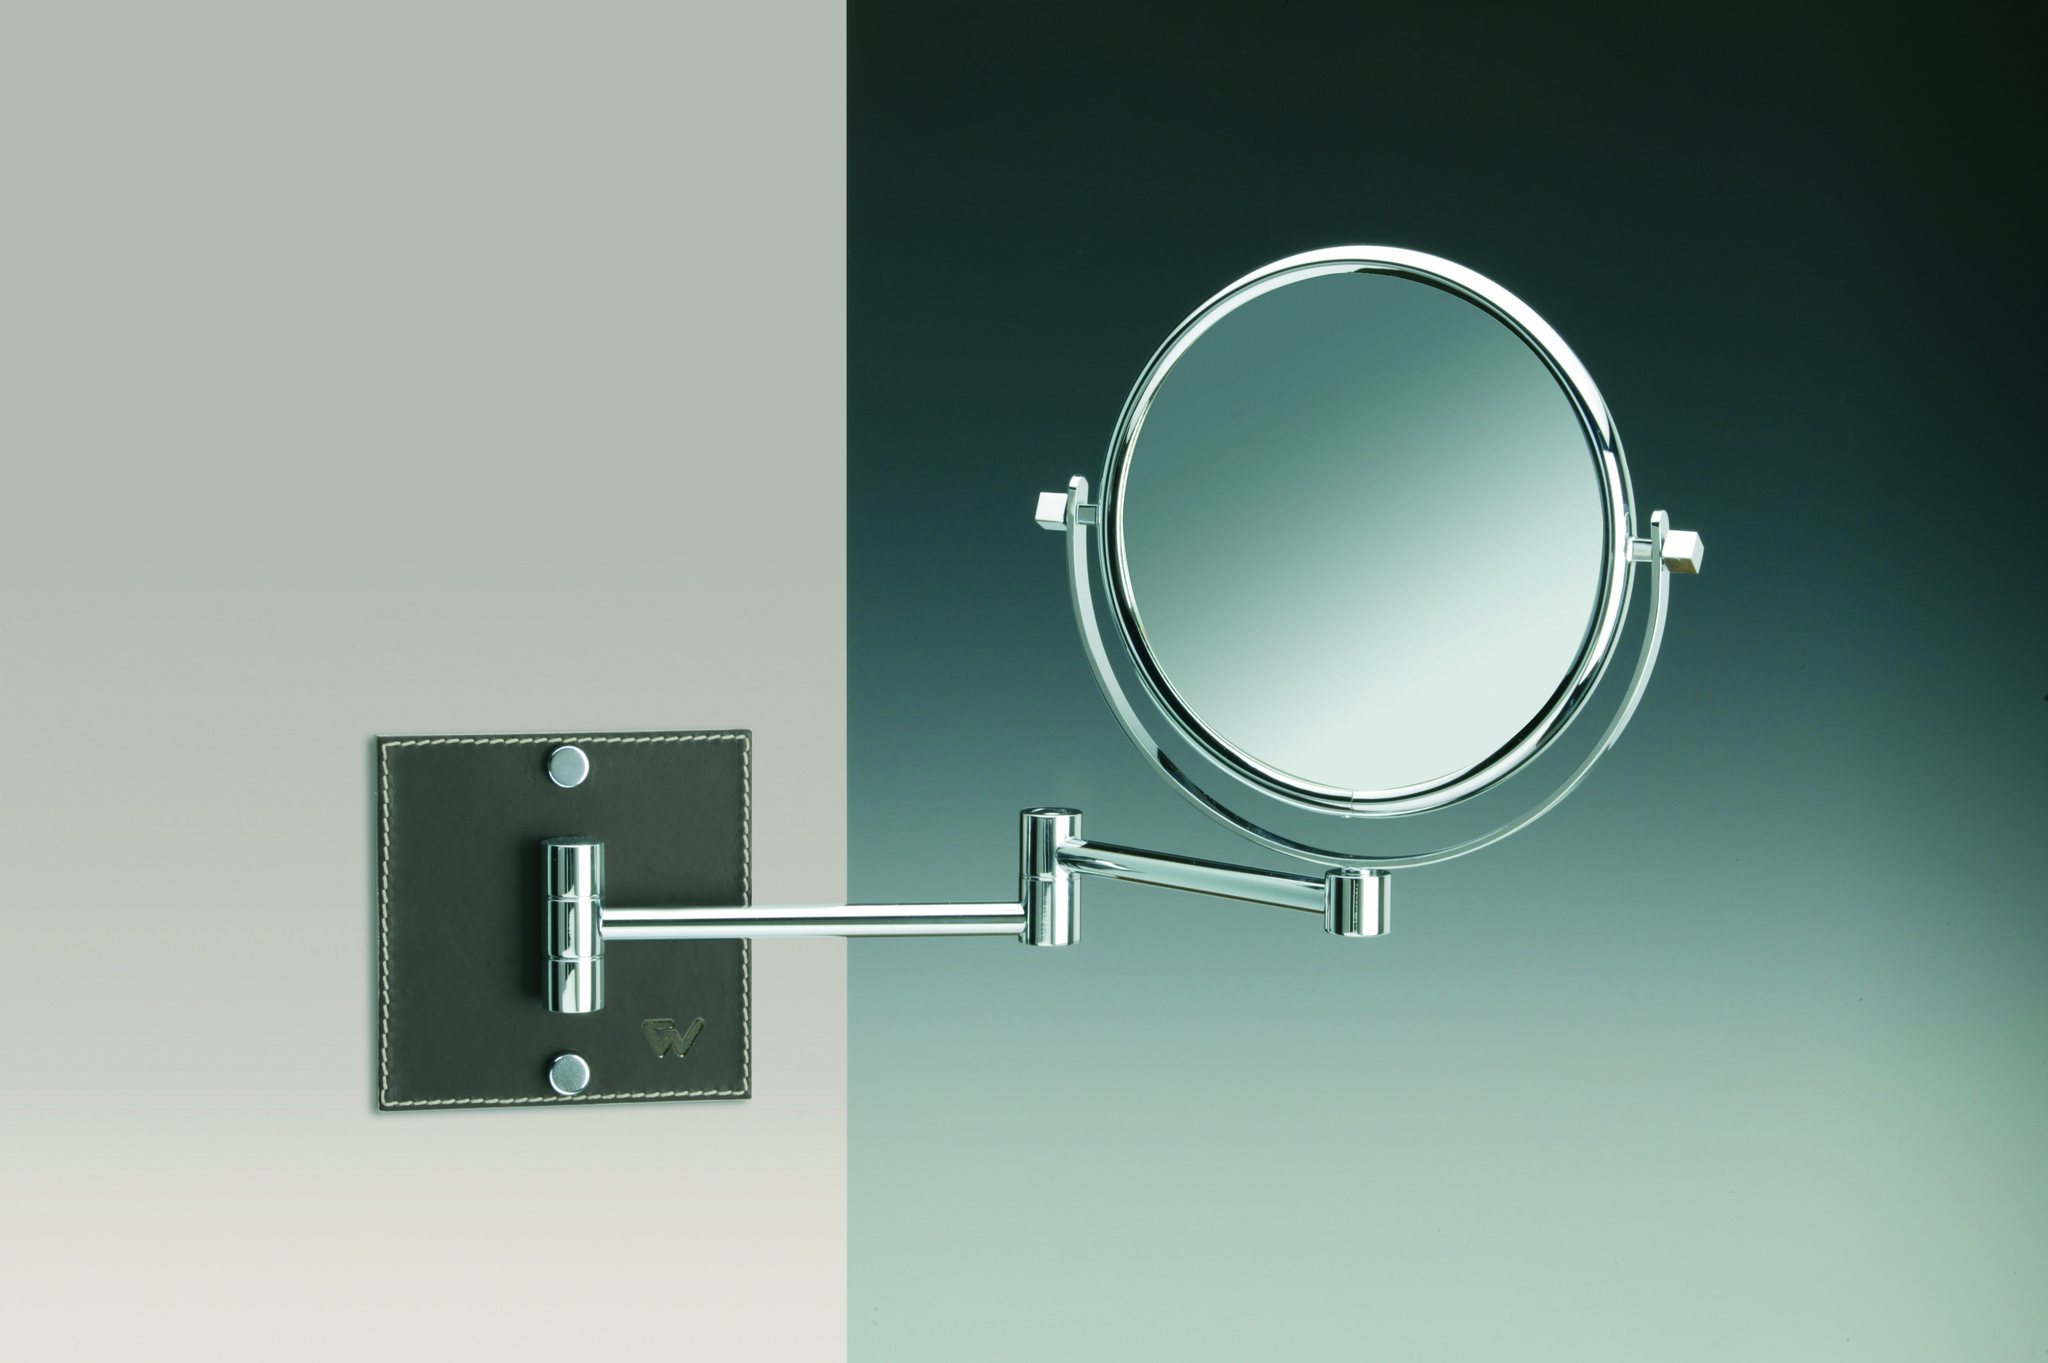 Зеркала Зеркало косметическое Windisch 99337R 7XOP Kenia elitnoe-zerkalo-kosmeticheskoe-99337-kenia-ot-windisch-ispaniya.jpg